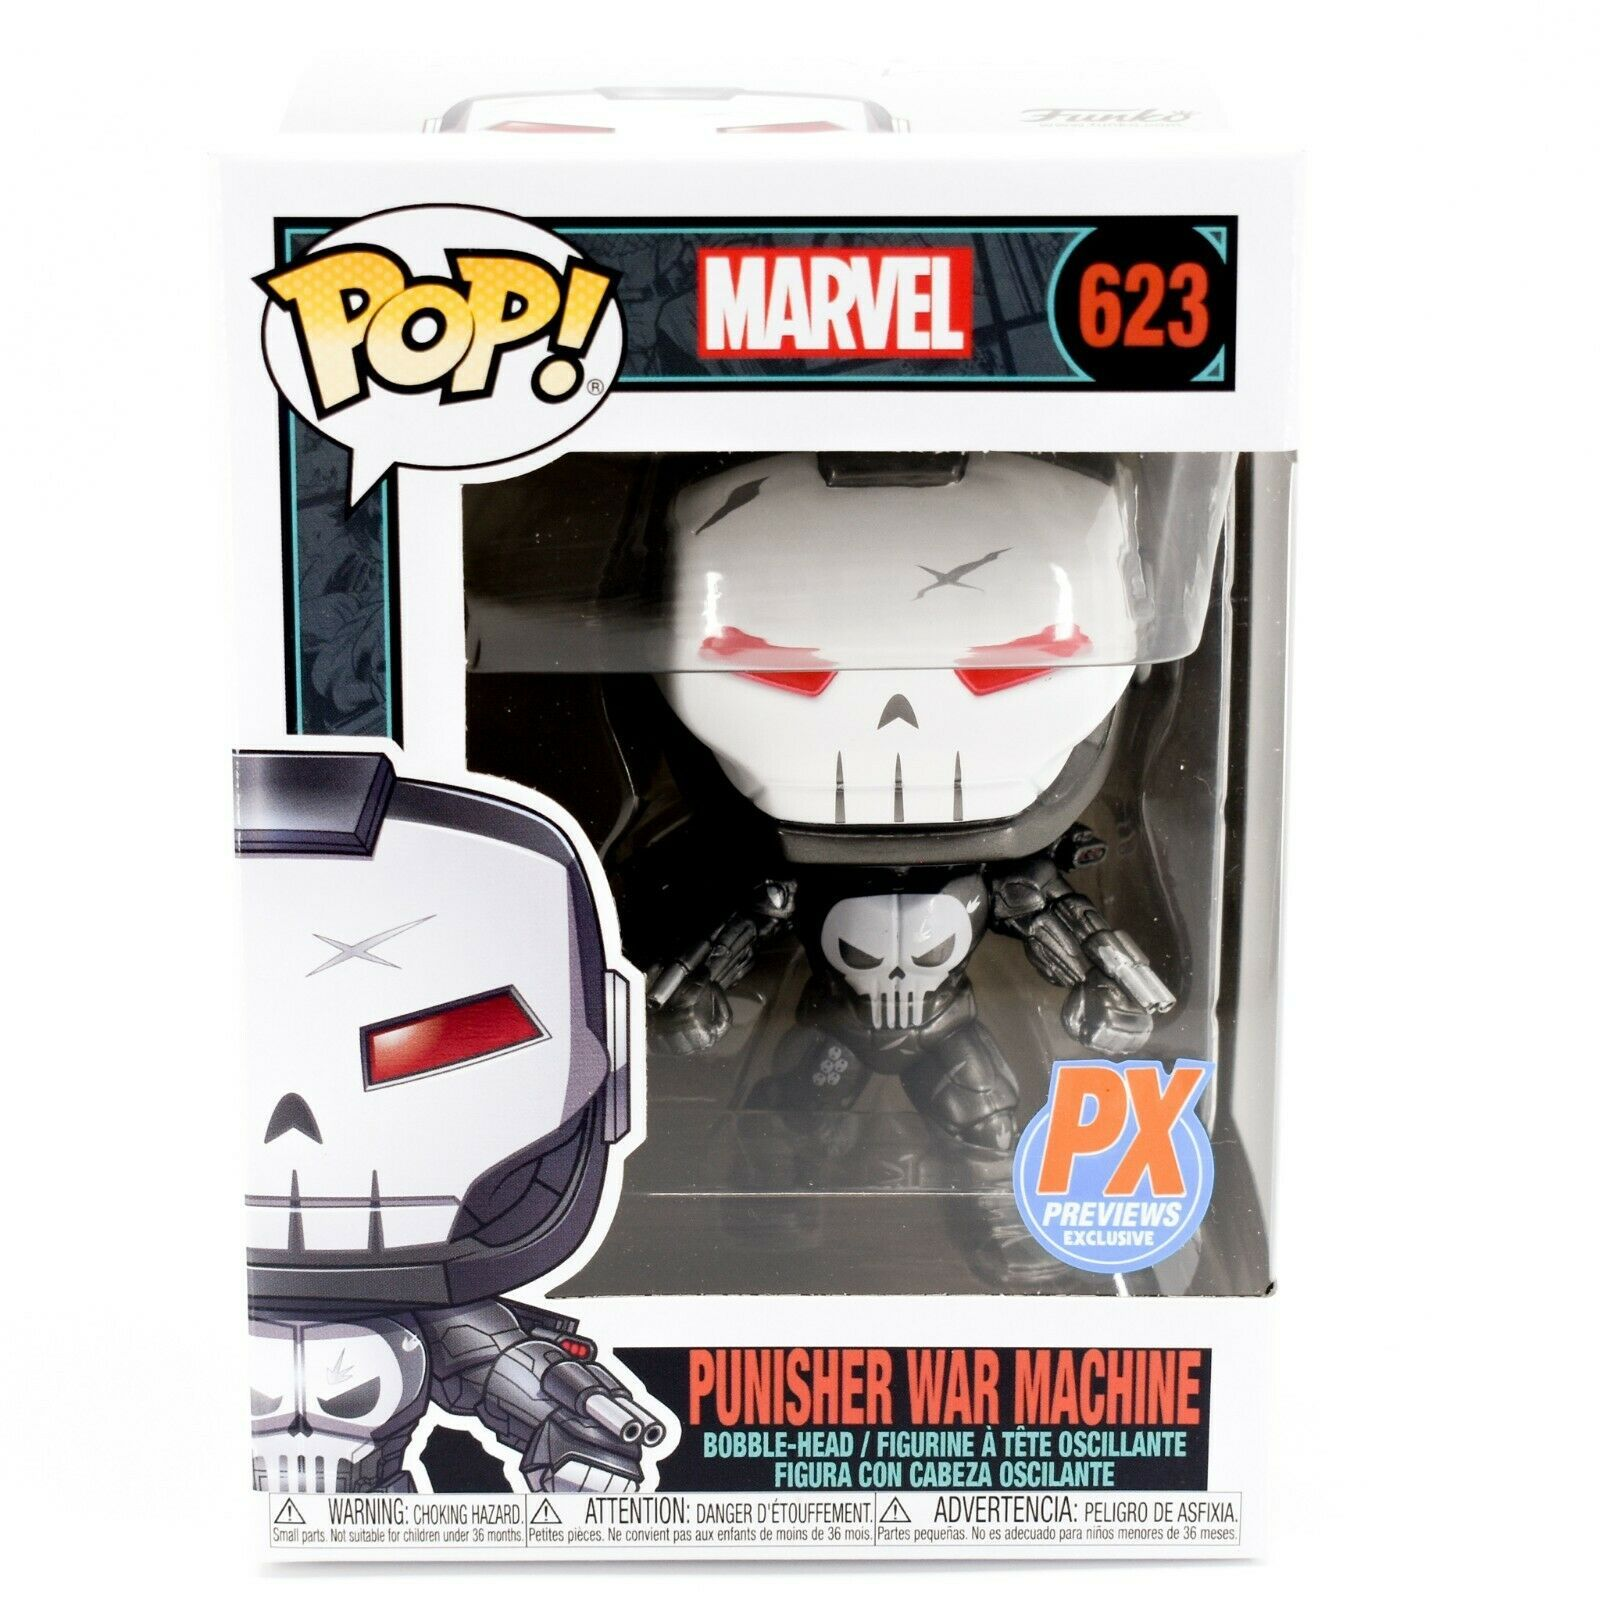 Funko Pop! Marvel Punisher War Machine PX Exclusive Bobble-Head Figure #623